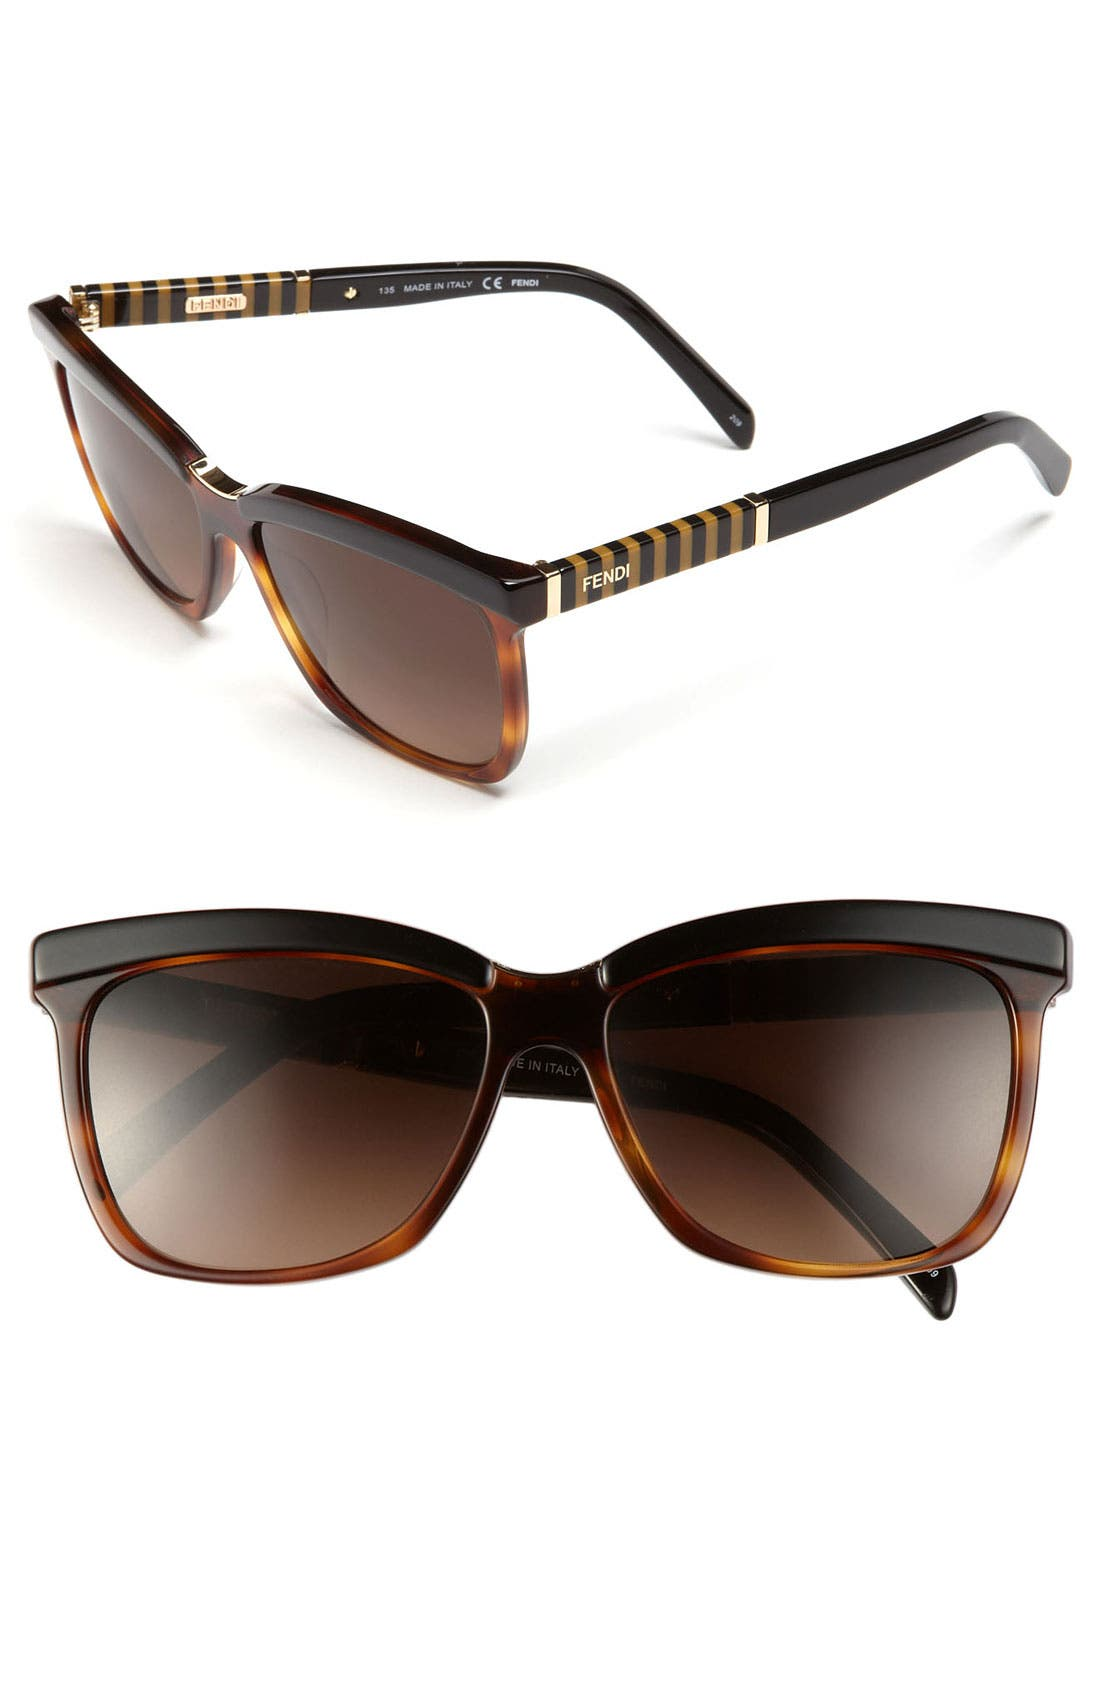 Alternate Image 1 Selected - Fendi 55mm Oversized Sunglasses